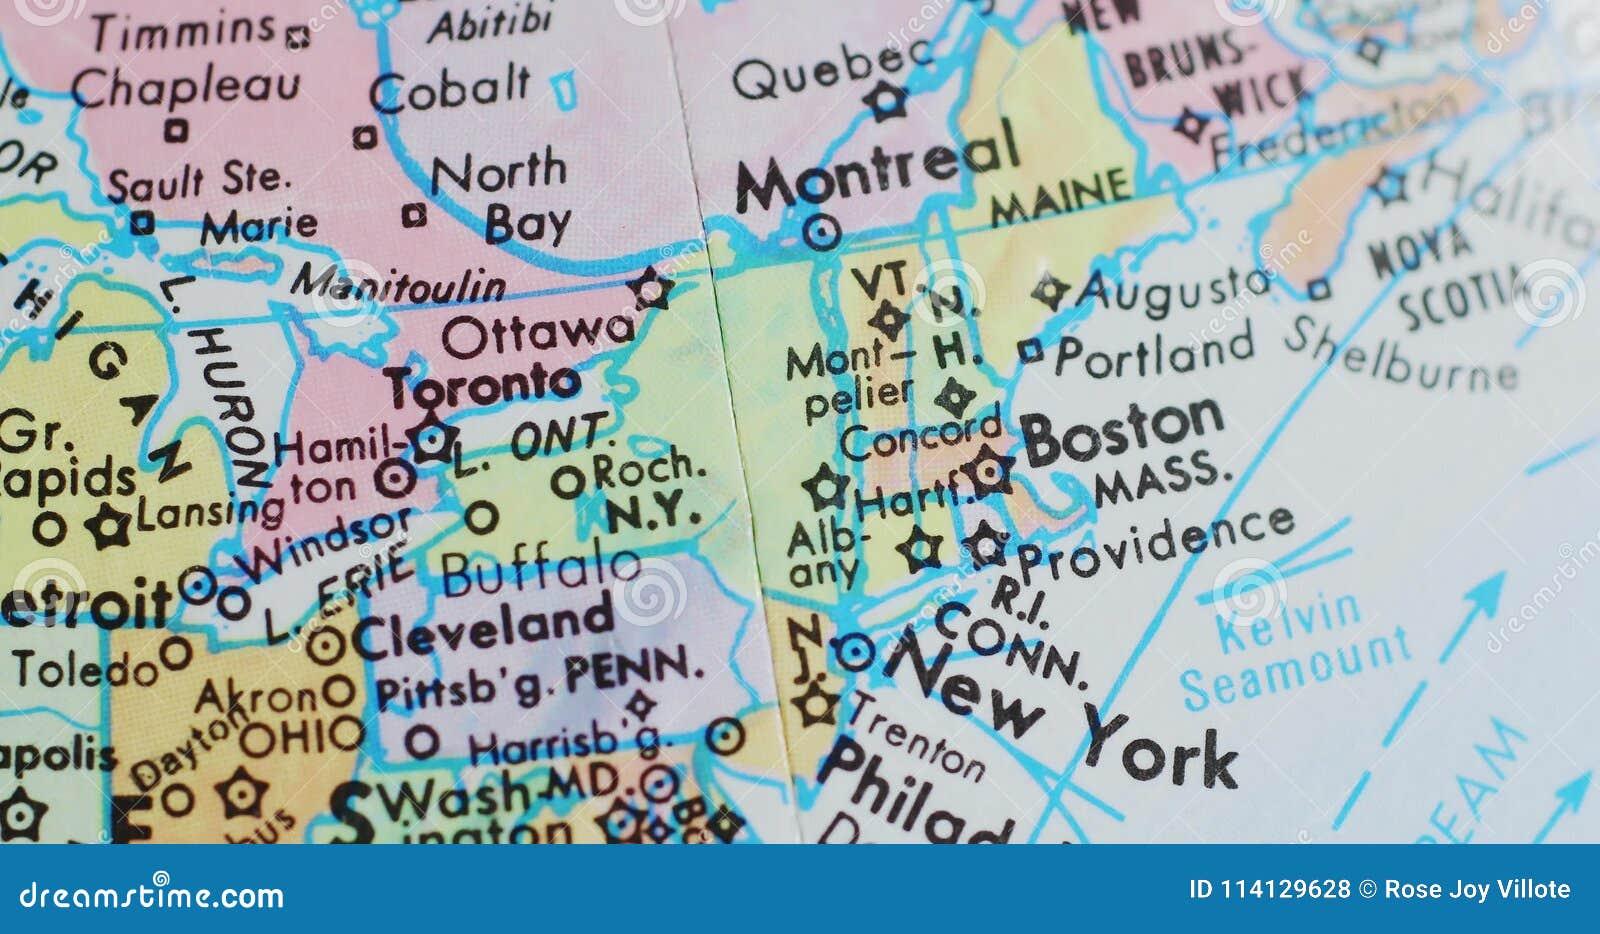 Spinning globe map of New York USA 4K. on piedmont on usa map, wyoming on usa map, united kingdom on usa map, london on usa map, camden on usa map, geneva on usa map, charlotte on usa map, glasgow on usa map, jacksonville on usa map, vicksburg on usa map, plymouth on usa map, dover on usa map, harrisburg on usa map, europe on usa map, gettysburg on usa map, georgetown on usa map, platte river on usa map, salt lake city on usa map, james river on usa map, ottawa on usa map,